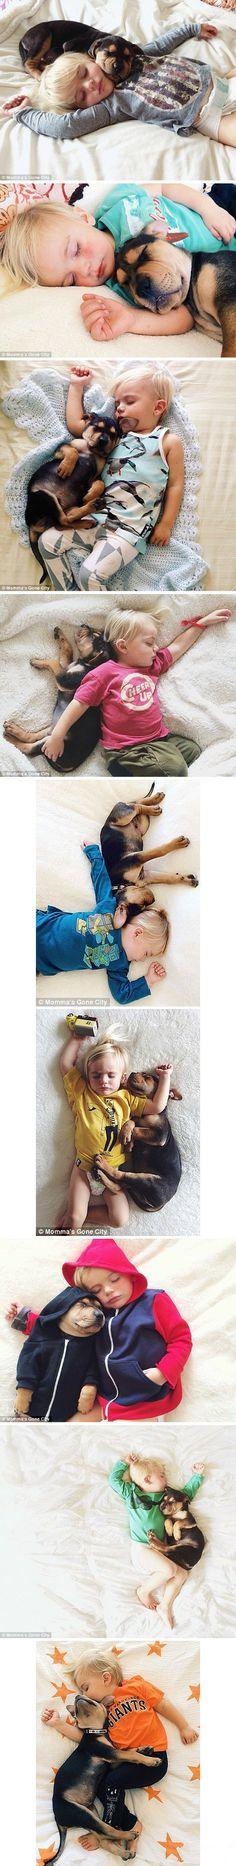 Their own Nap time~~